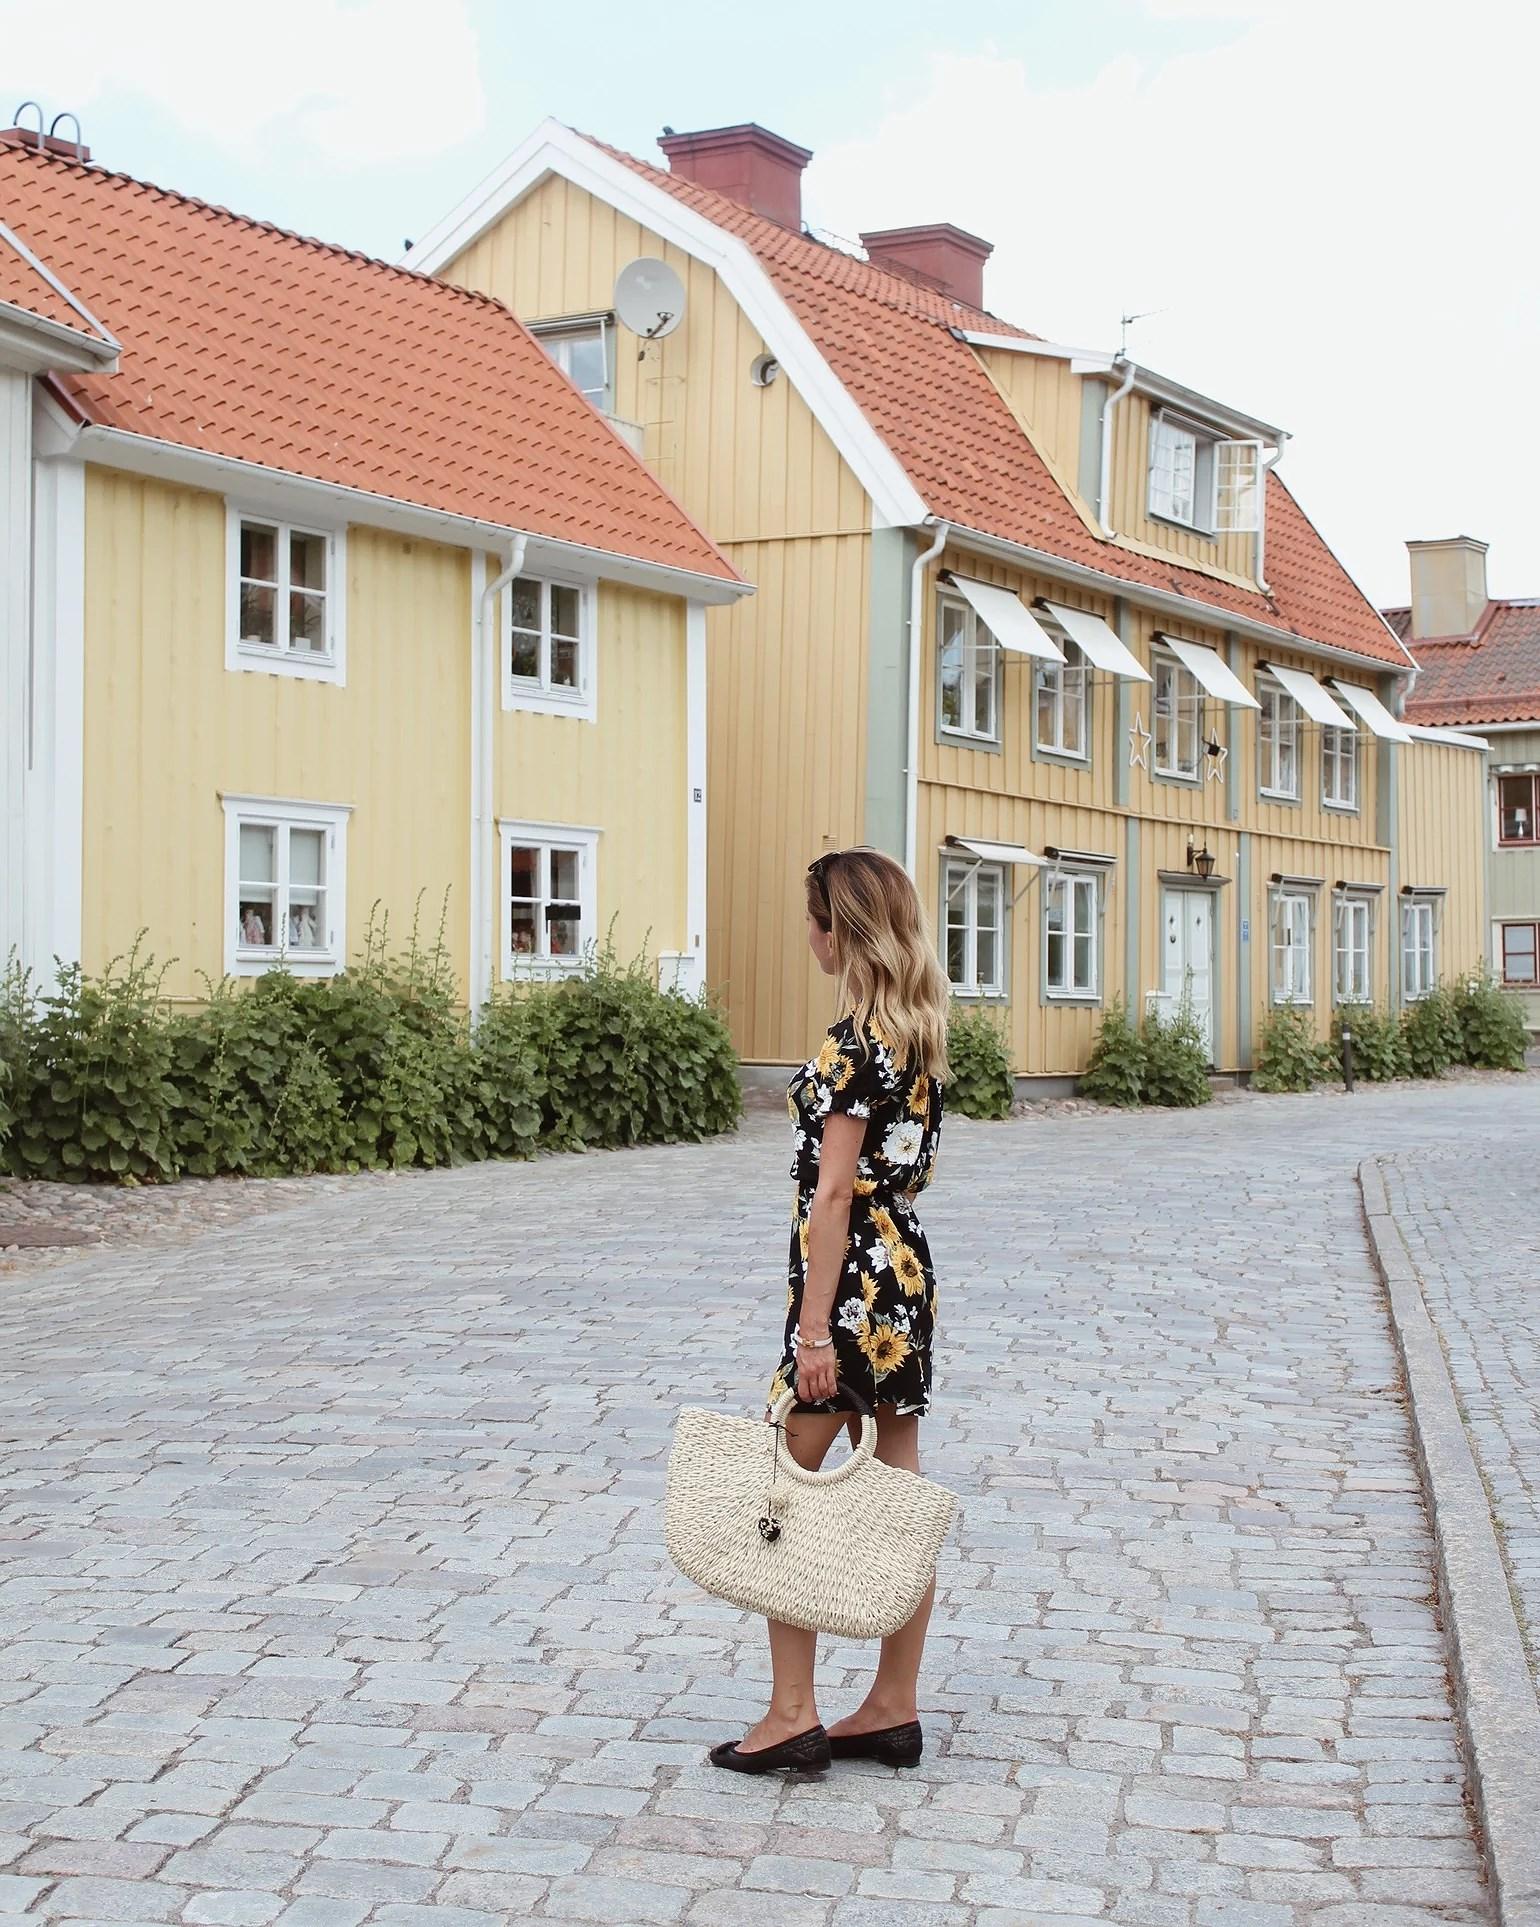 En mysig sommarstad i Sverige <3